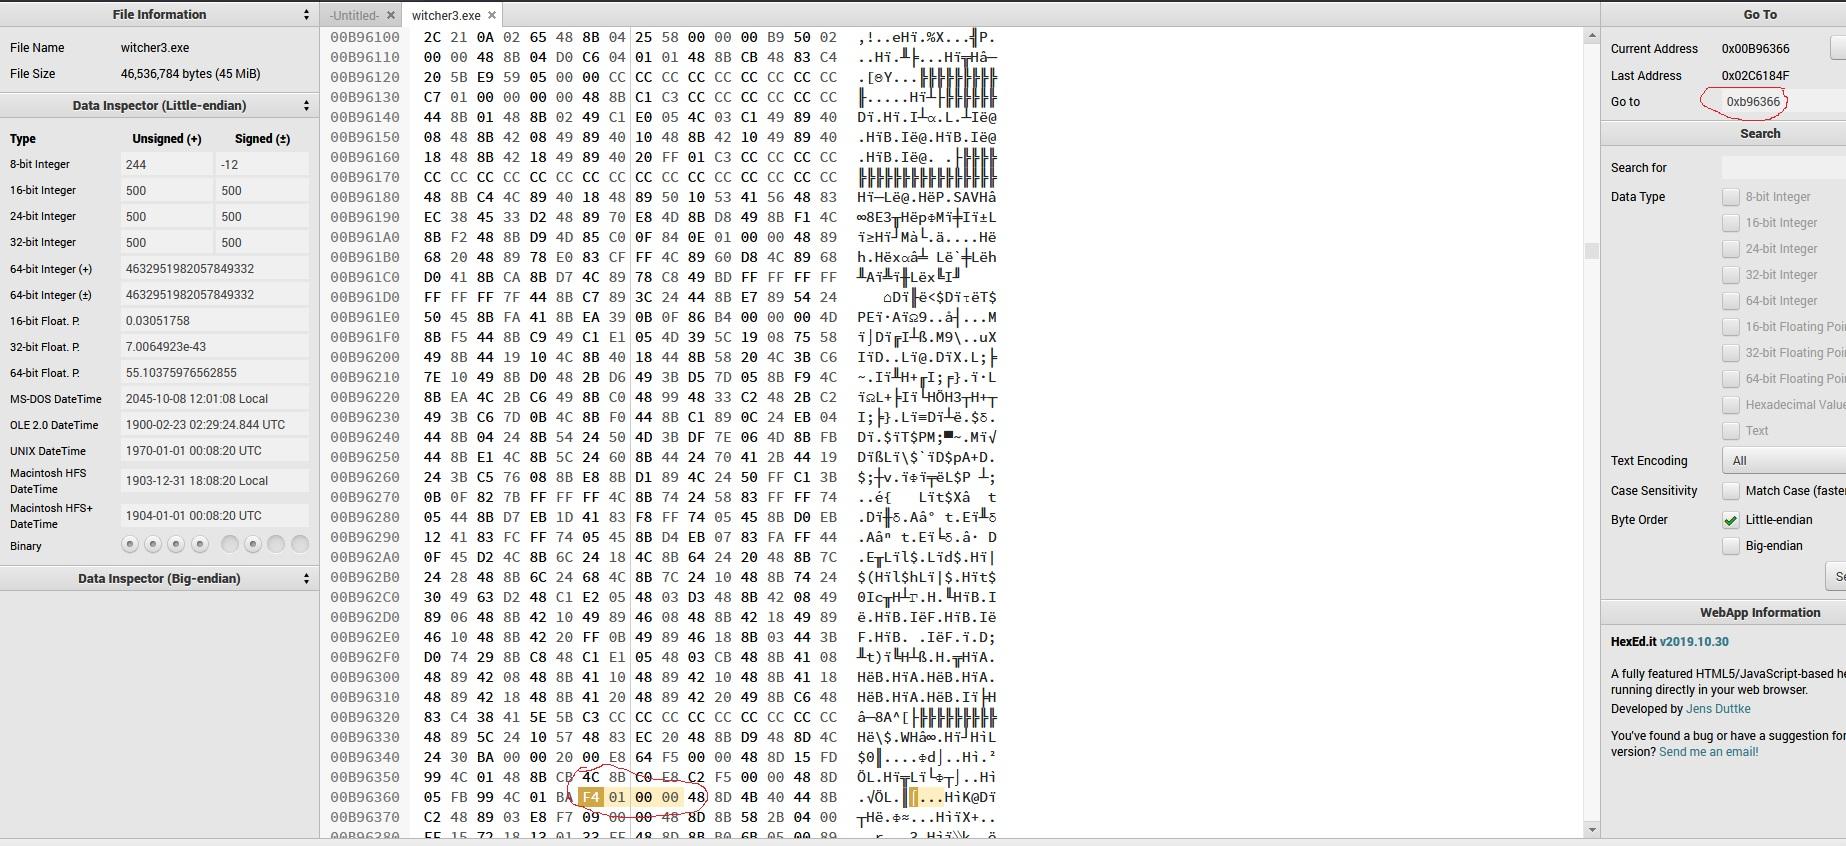 Hexed.it Screen Shot.jpg